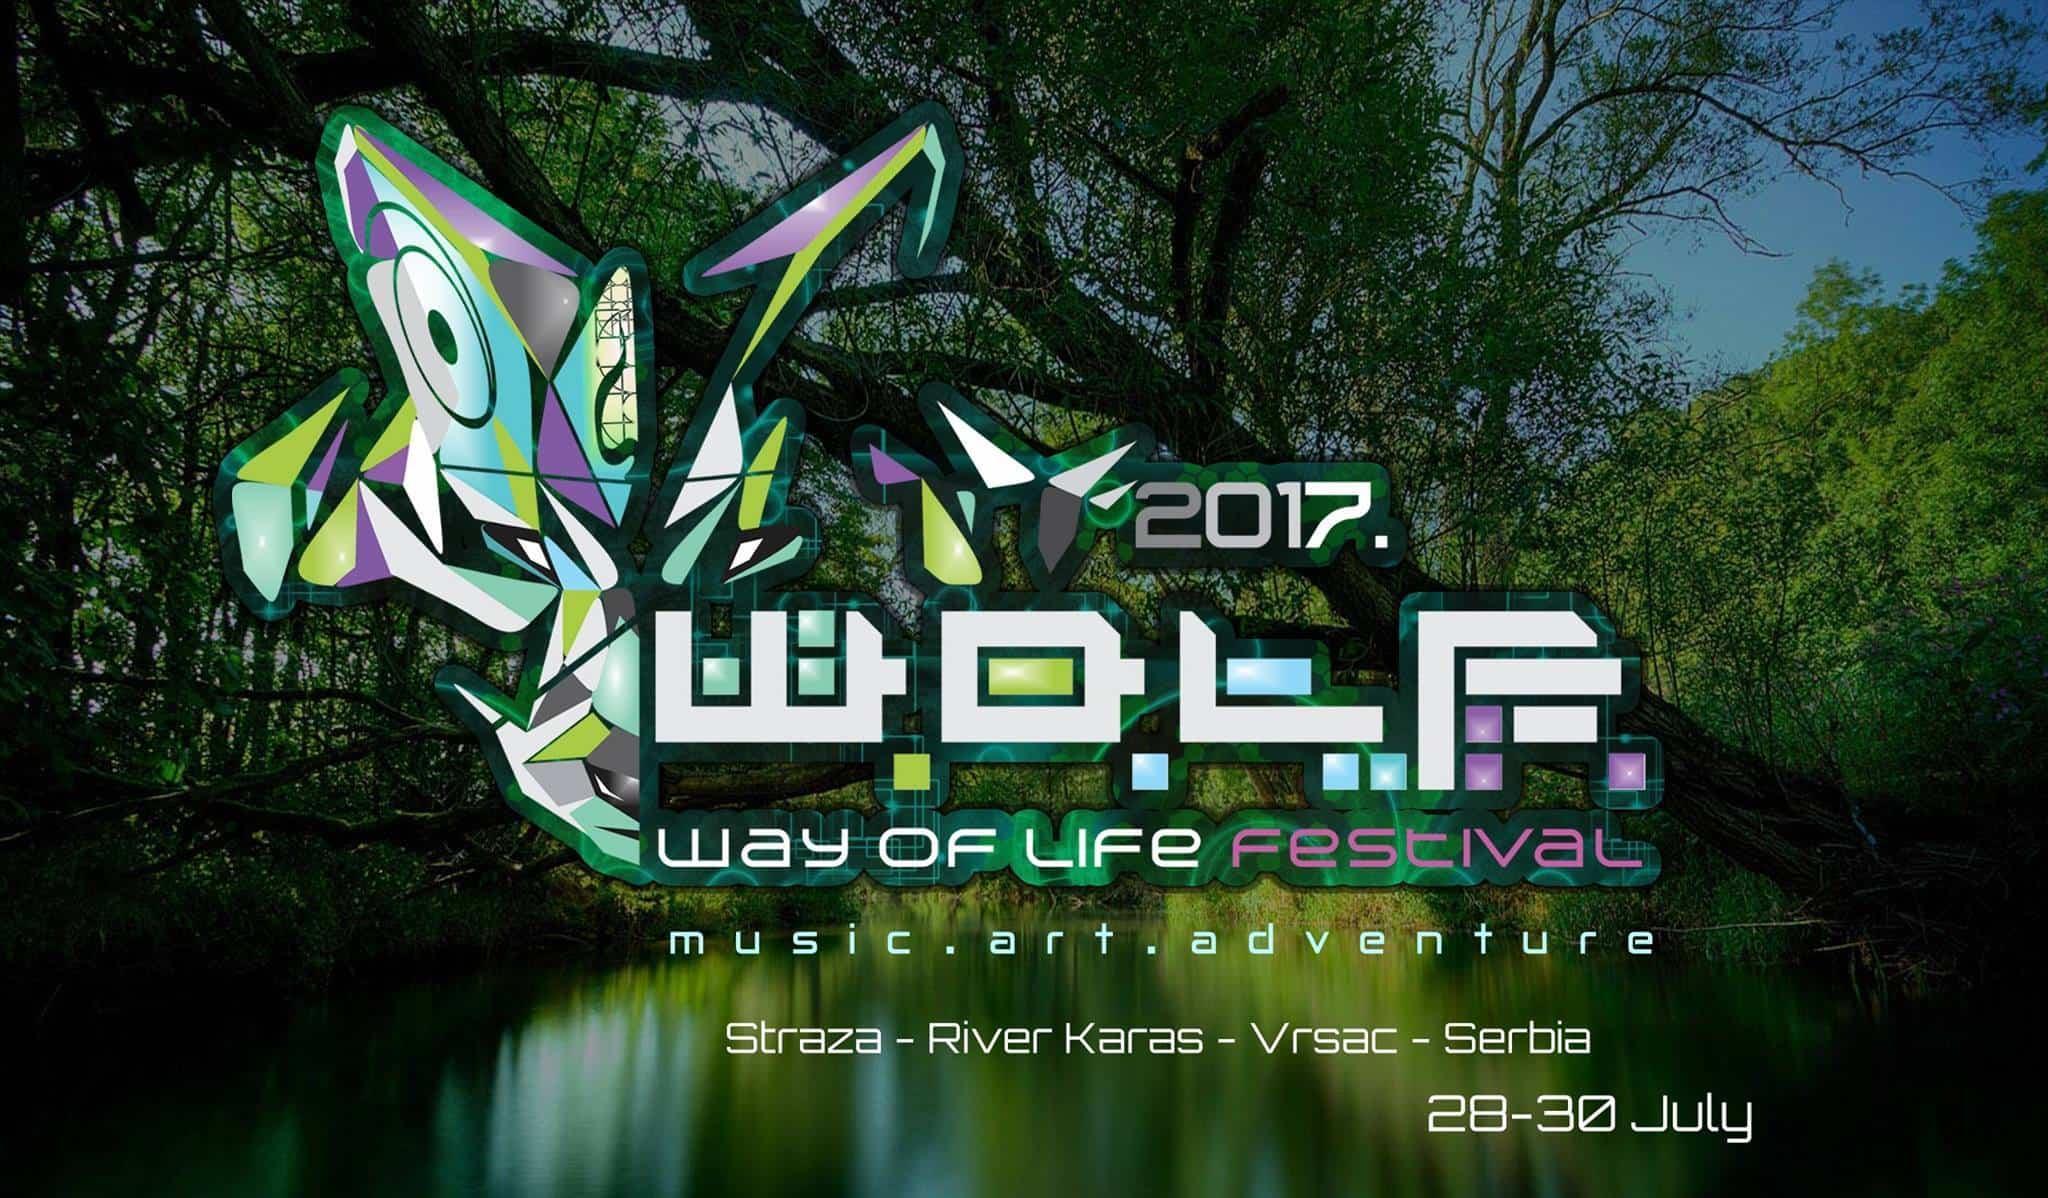 W.O.L.F. 2017 - Psytrance festival